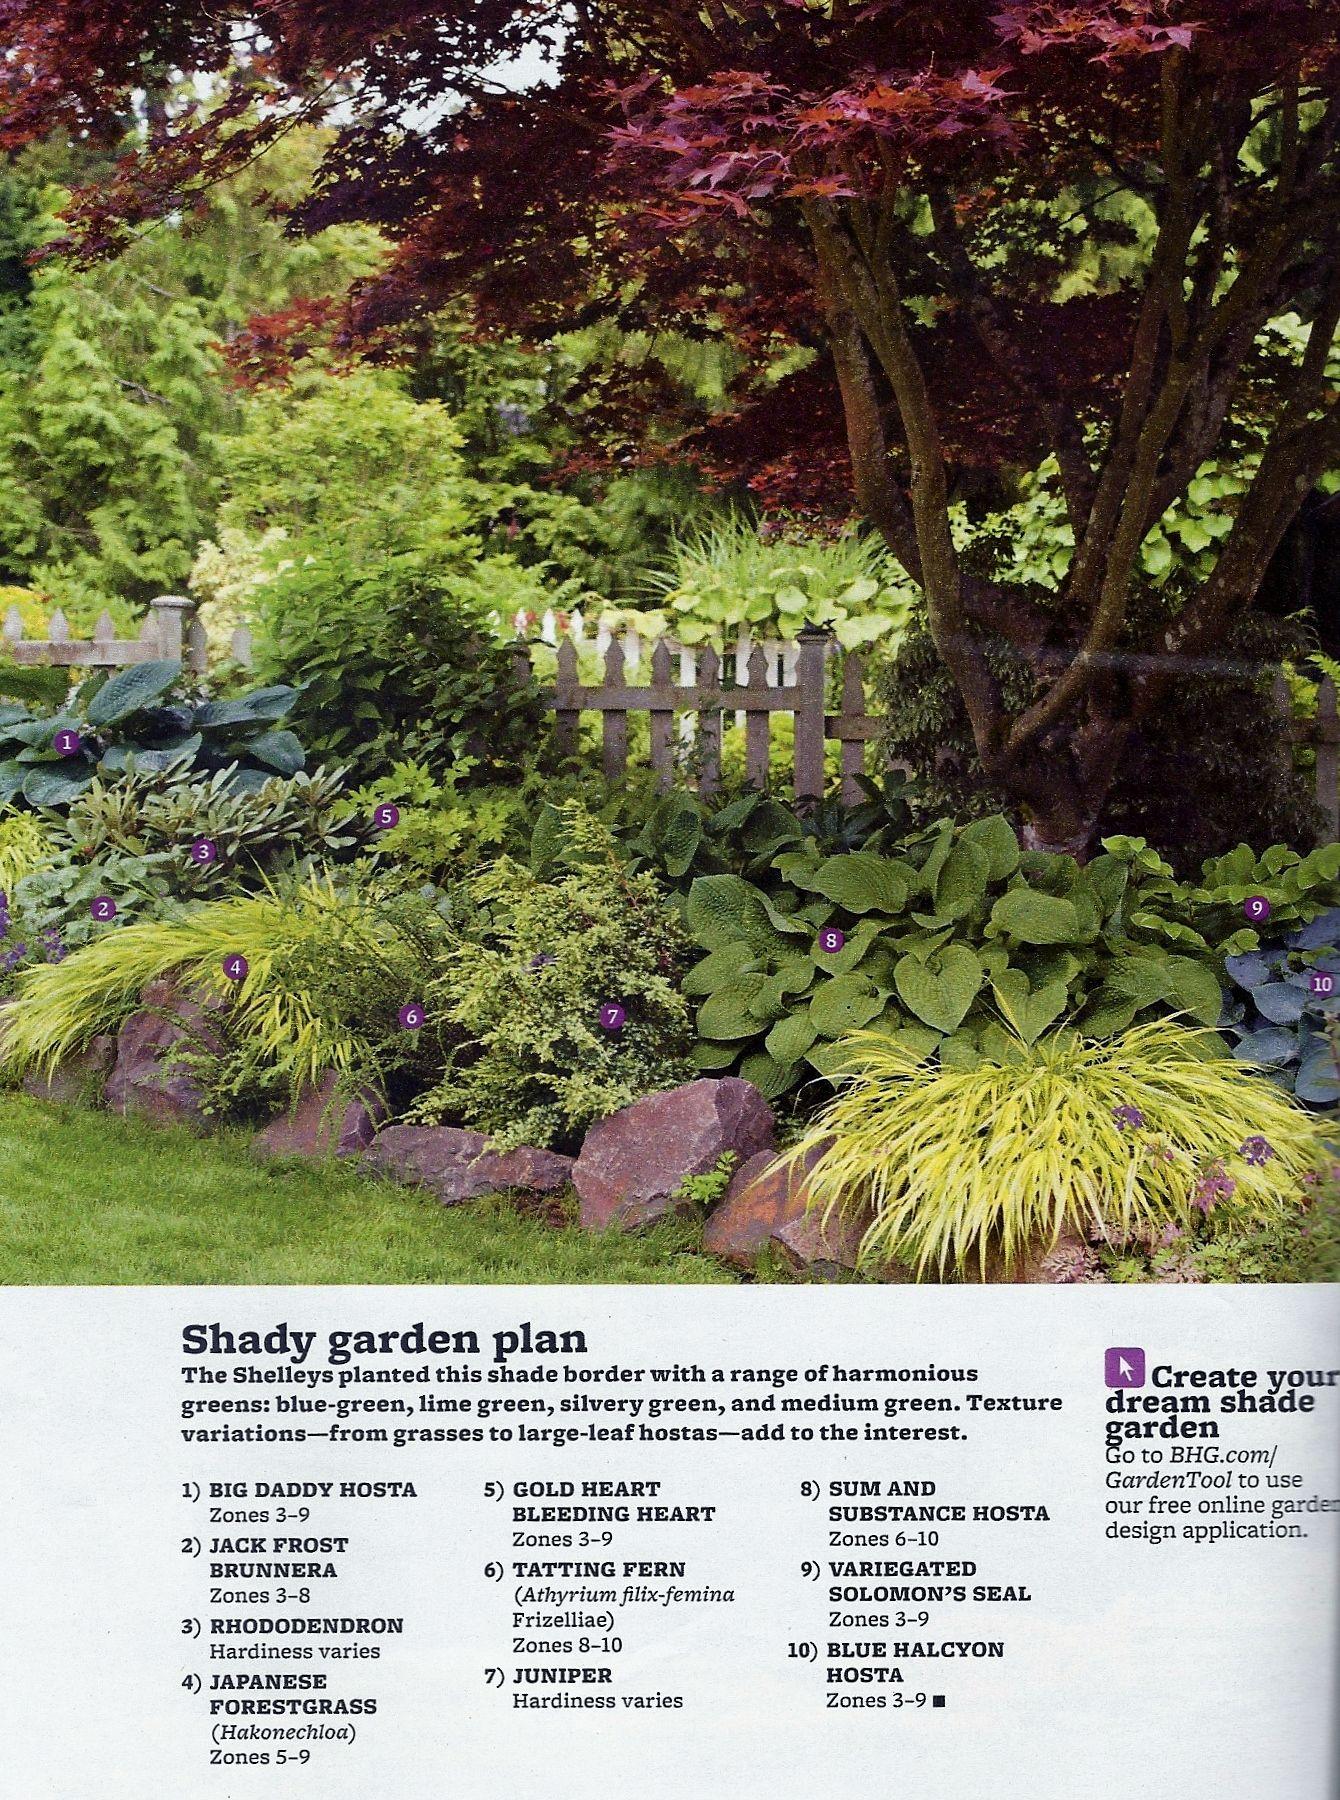 Better homes and gardens magazine august garden ideas